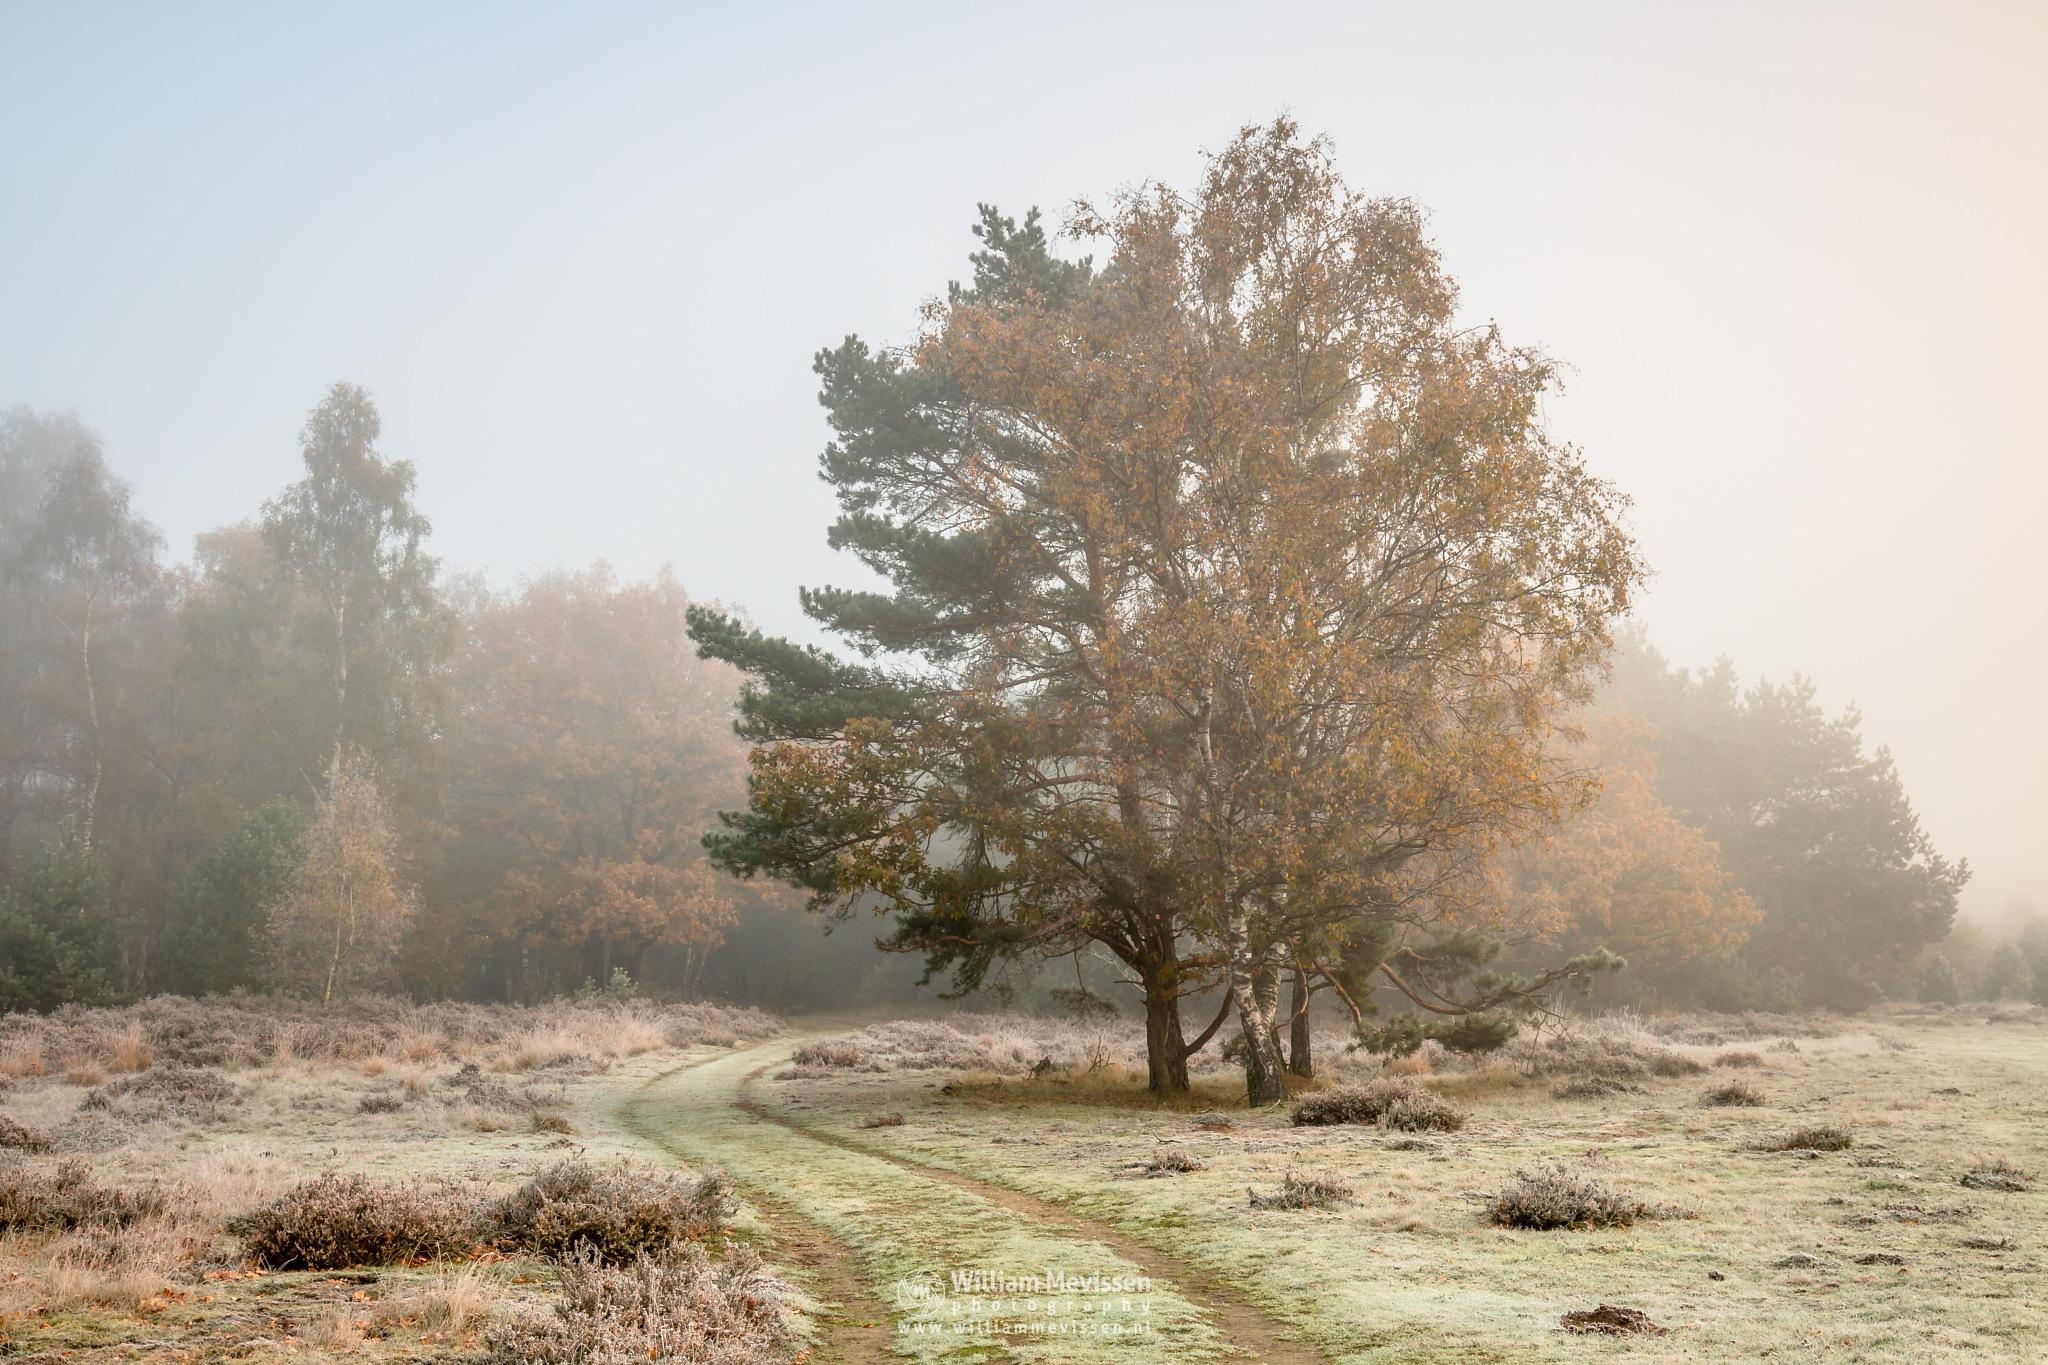 Autumn Colors In The Mist by William Mevissen